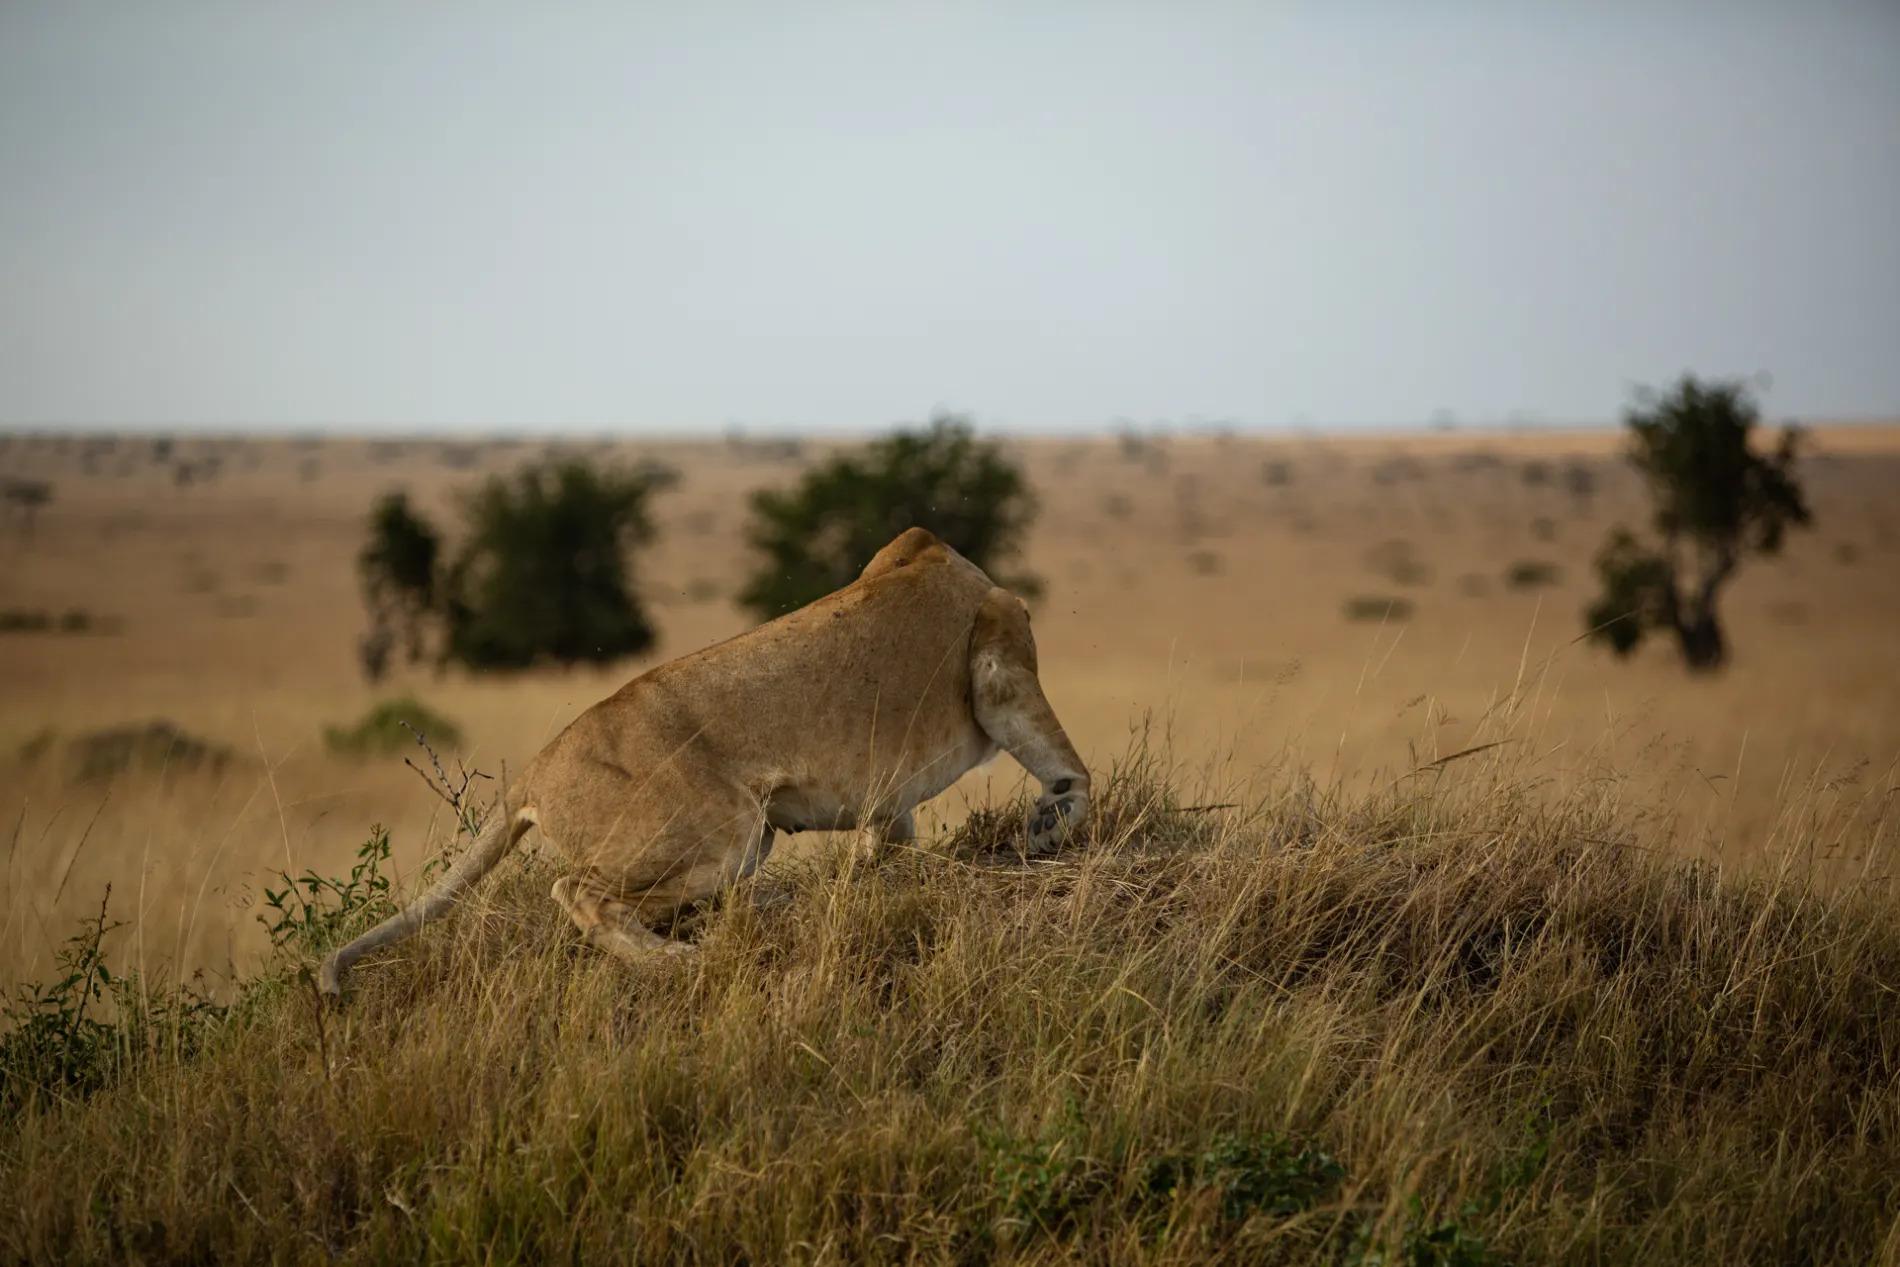 Lioness down